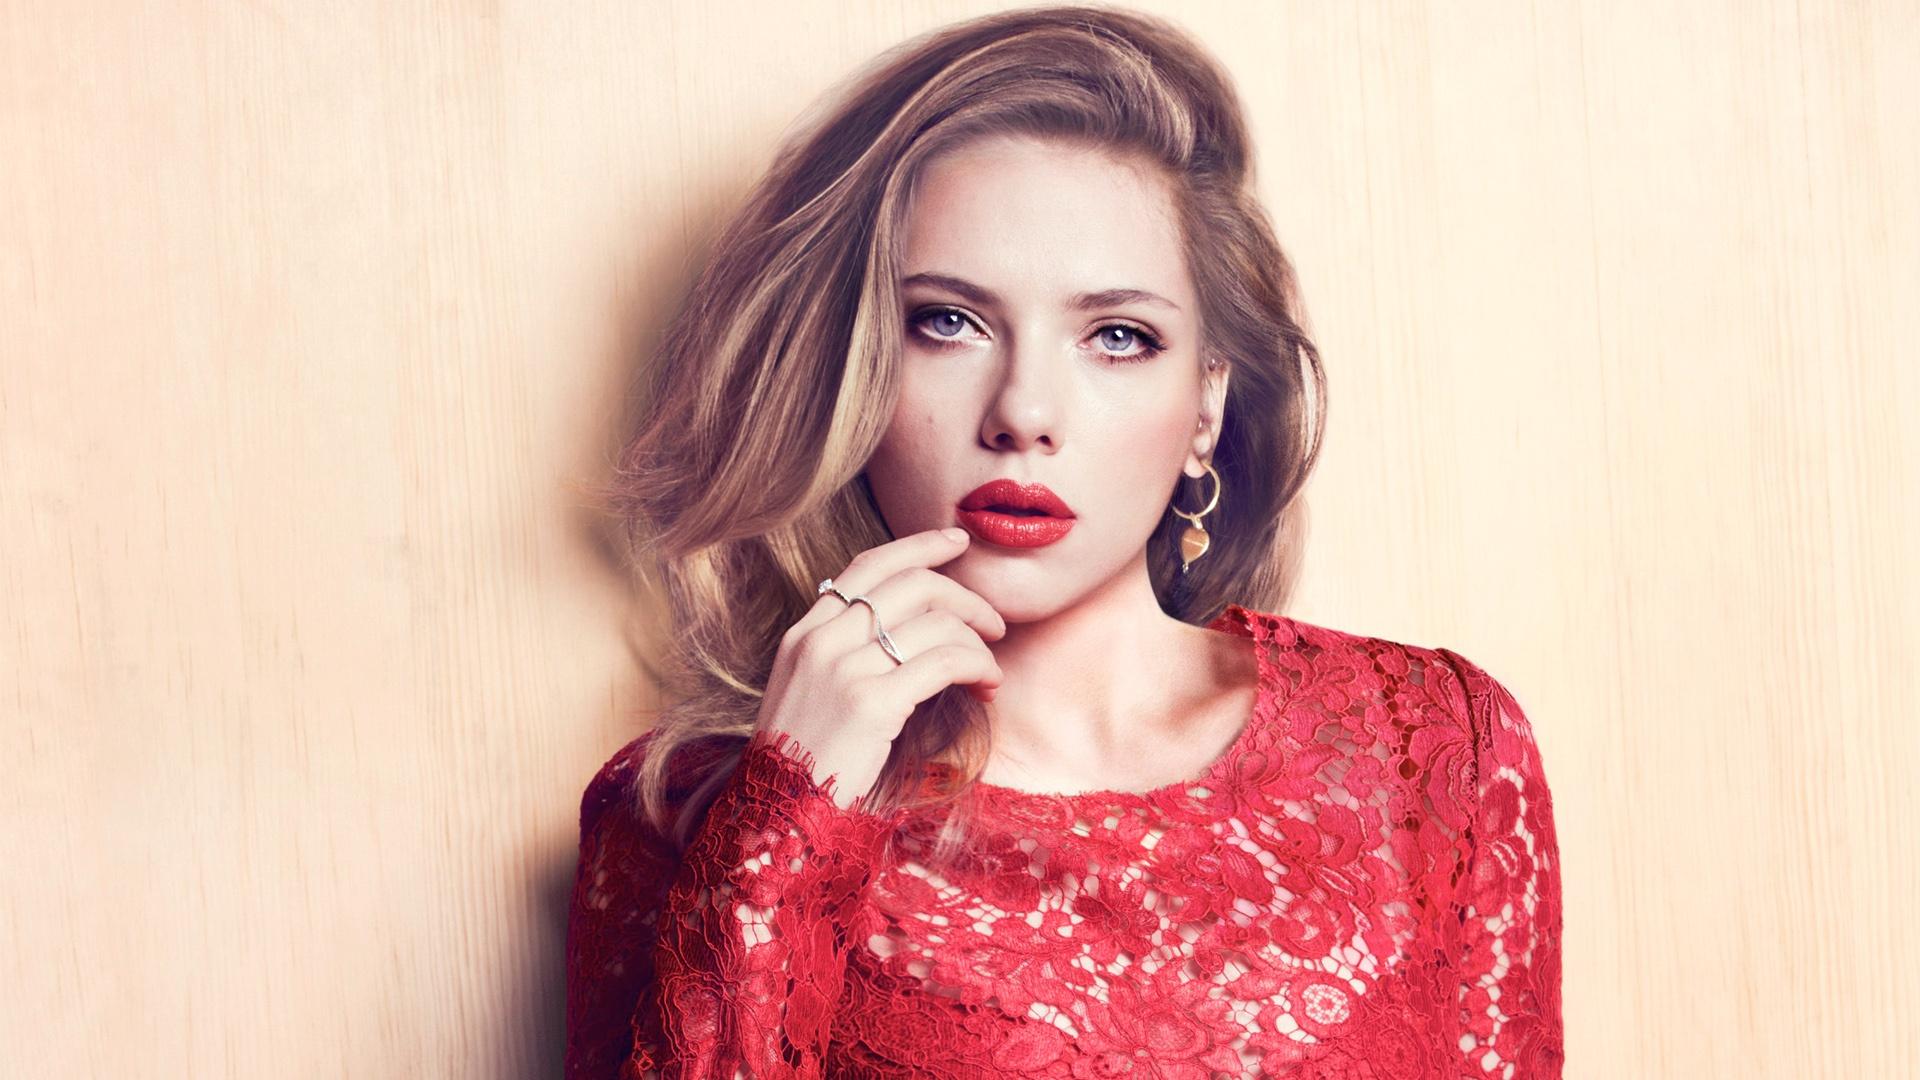 http://s7.picofile.com/file/8240540168/Scarlett_Johansson_2_.jpg